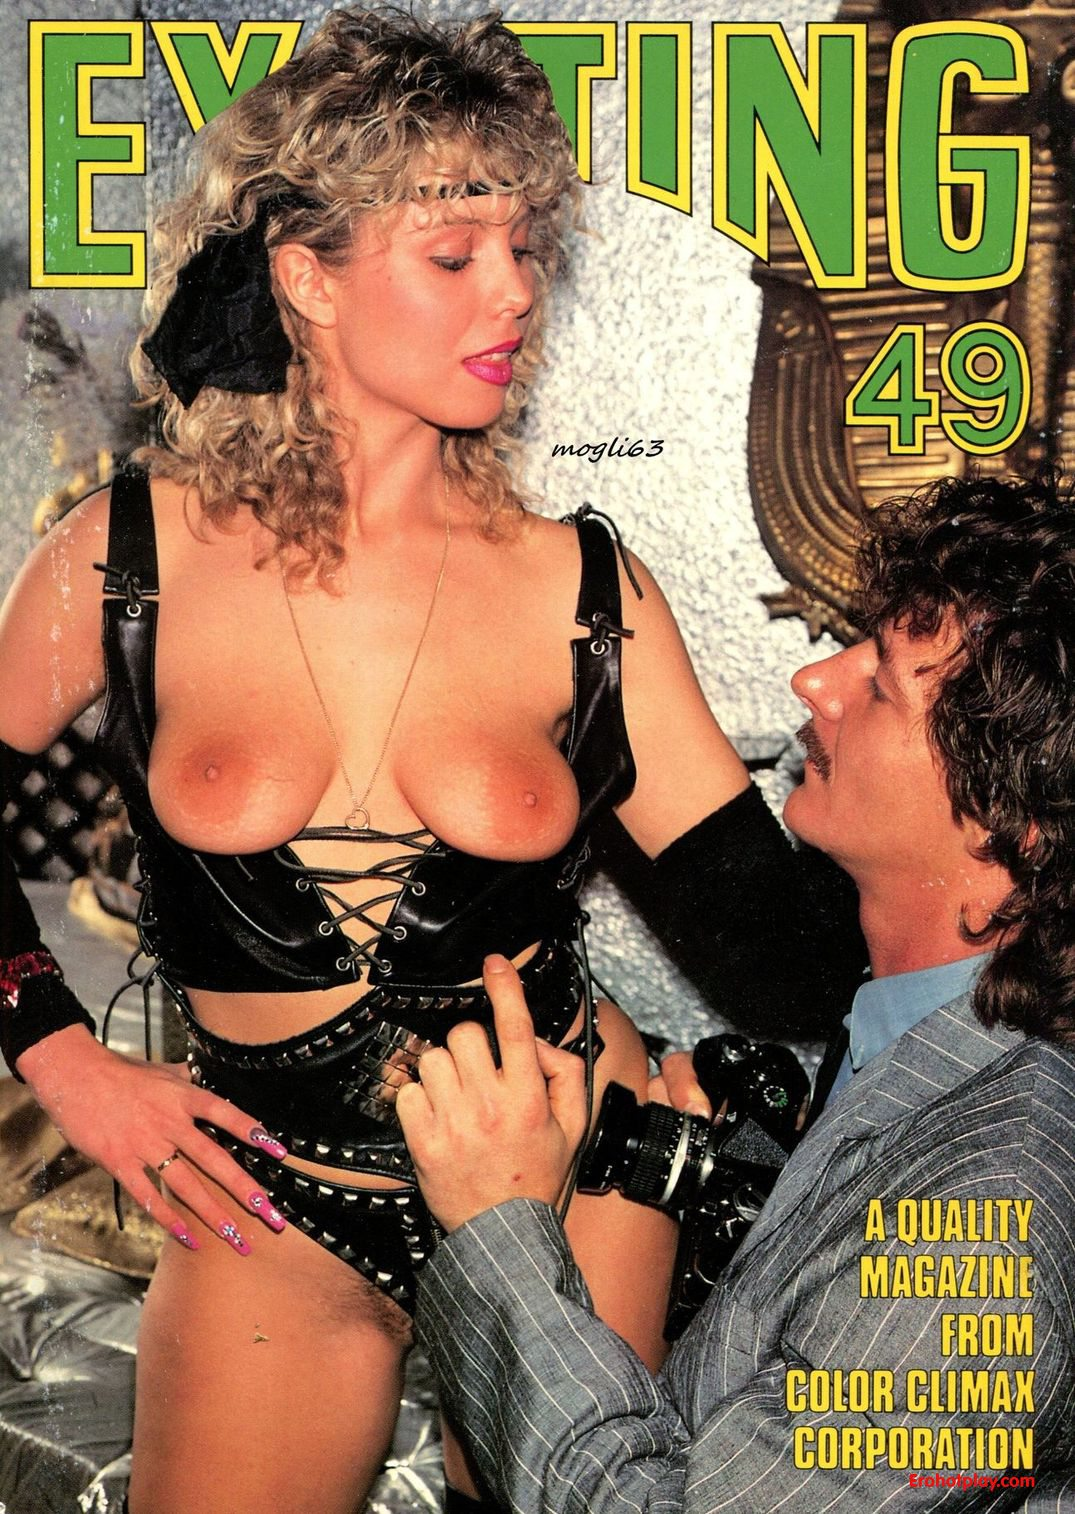 Порно журнал еще фото фото 691-10